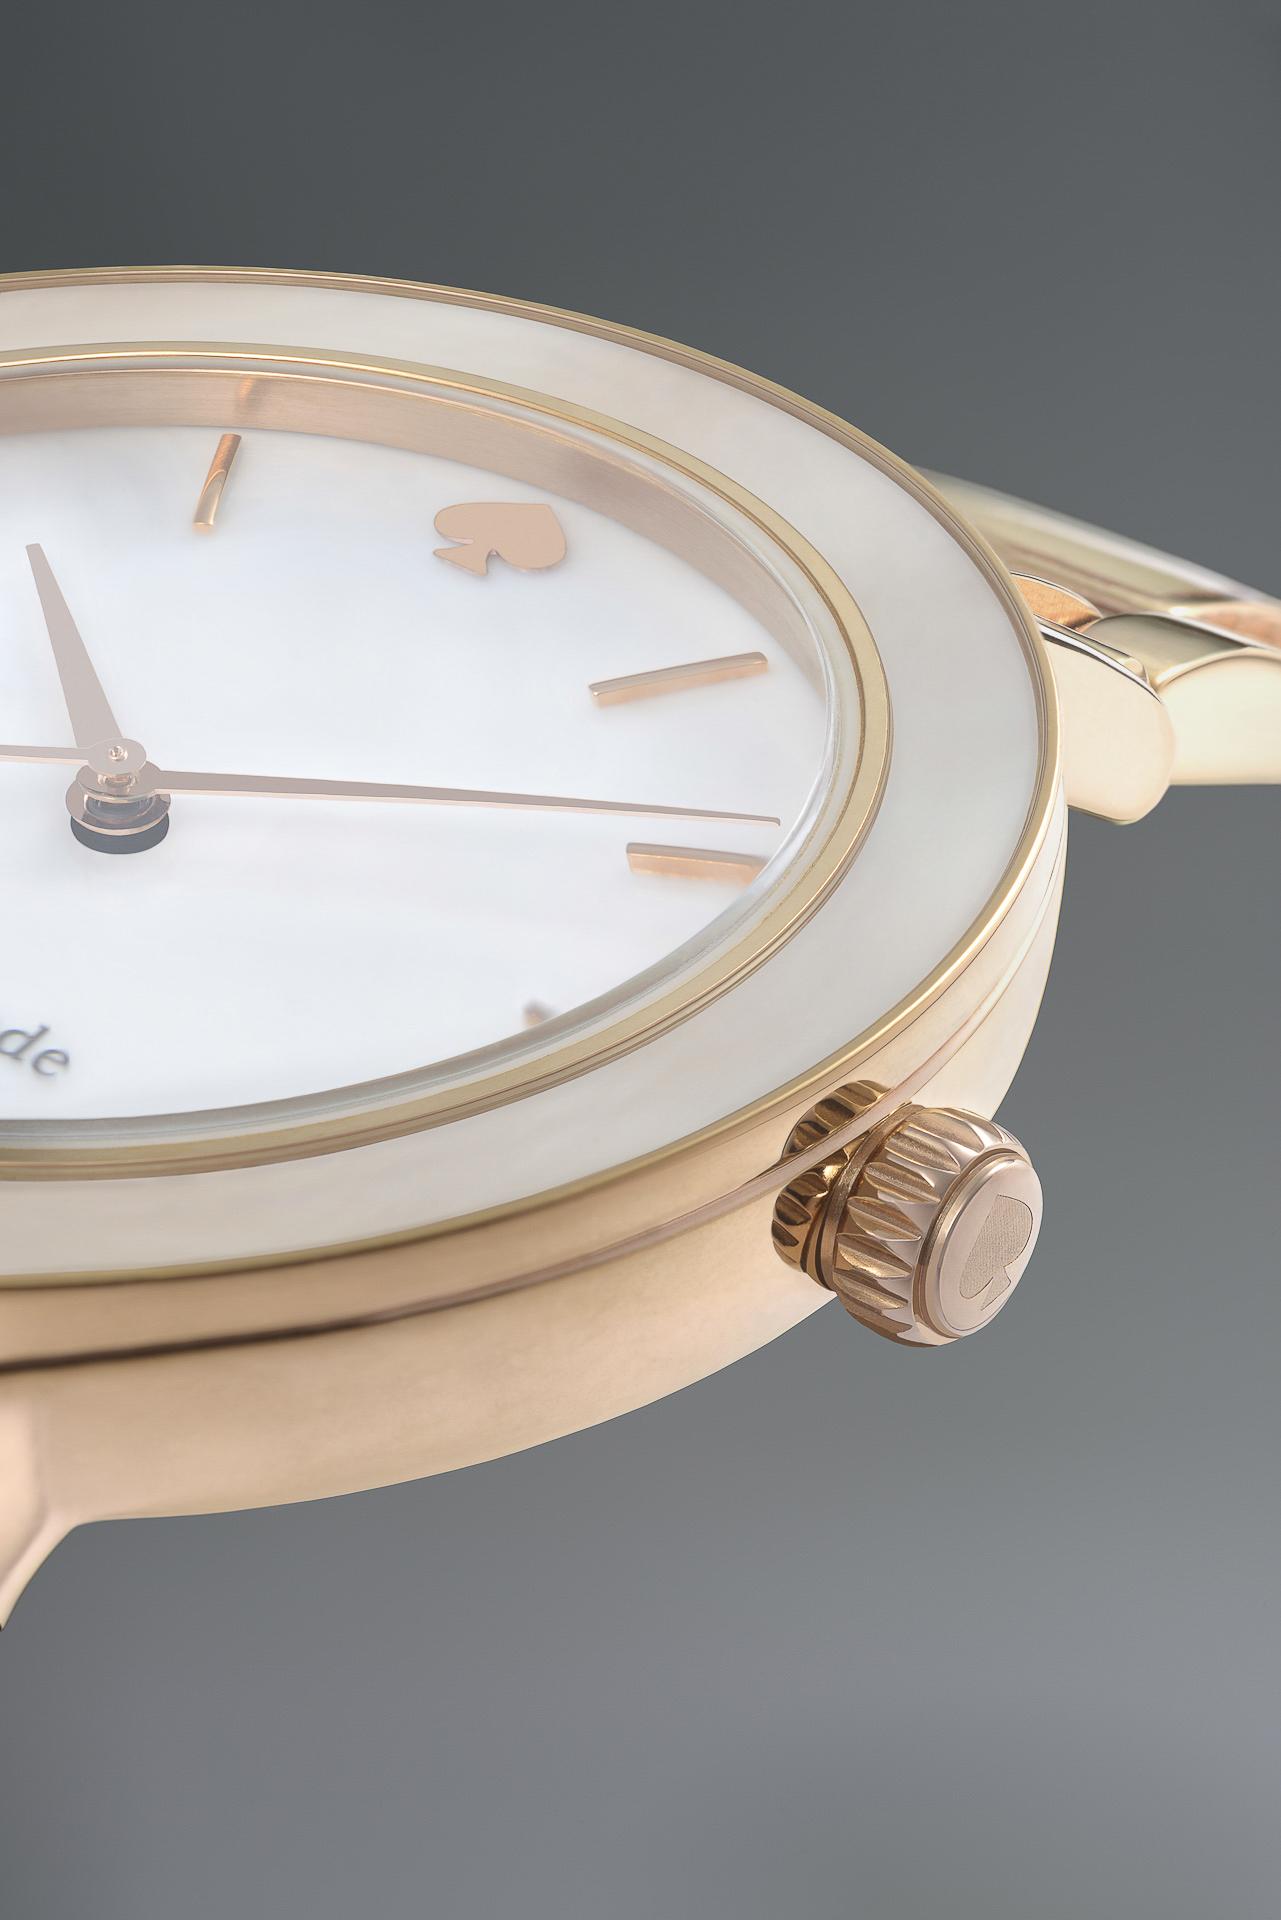 2017 portfolio wrist watch Kate spade_